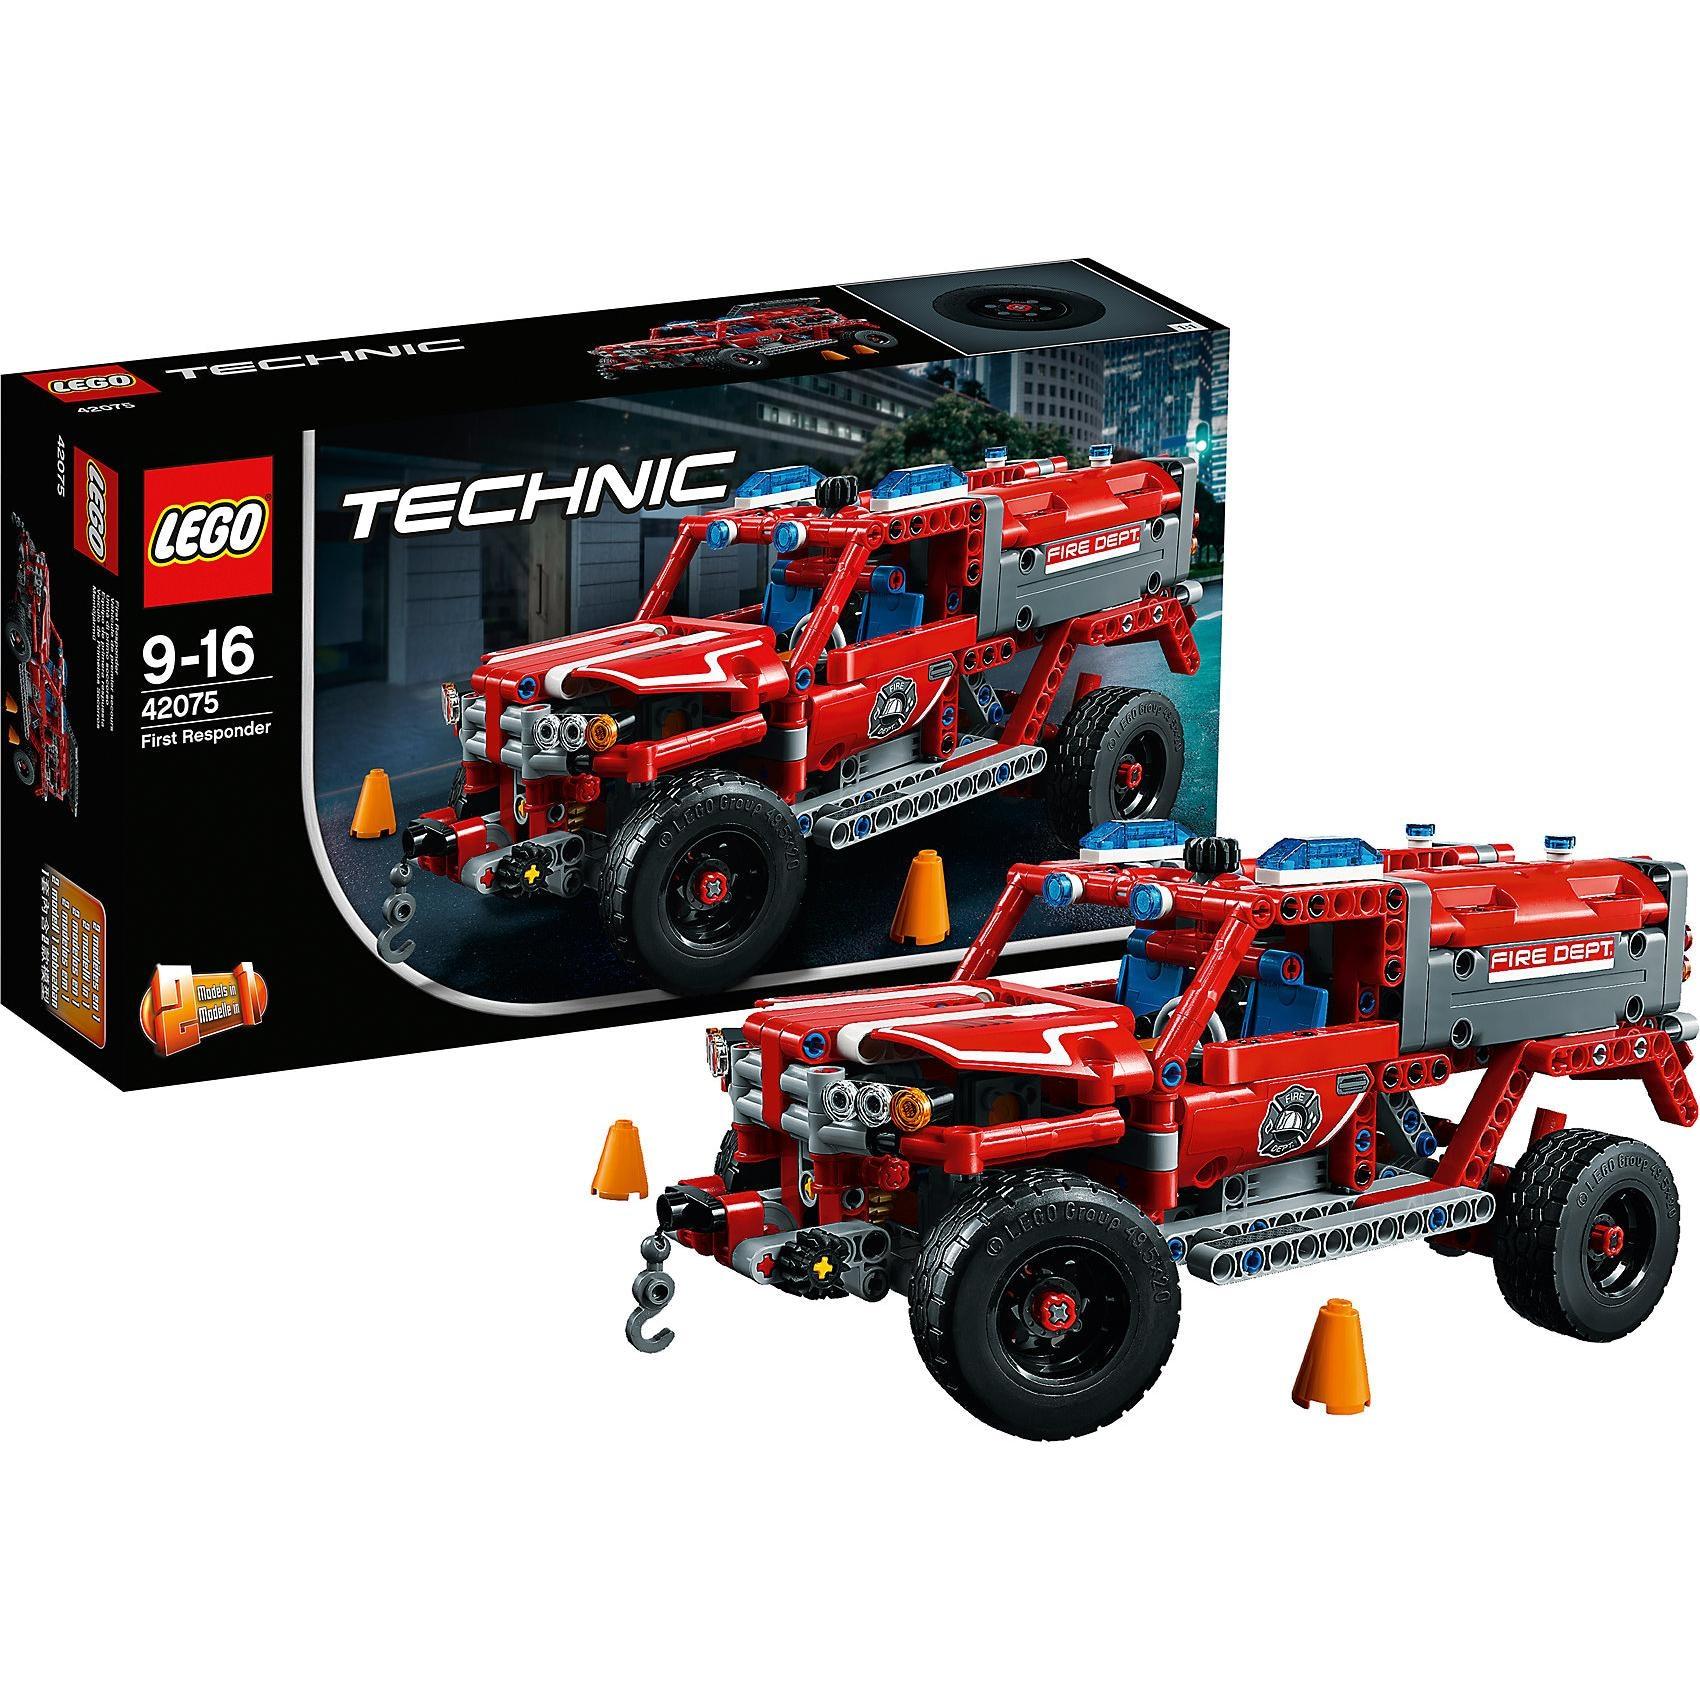 Lego Technic 42075 First Responder